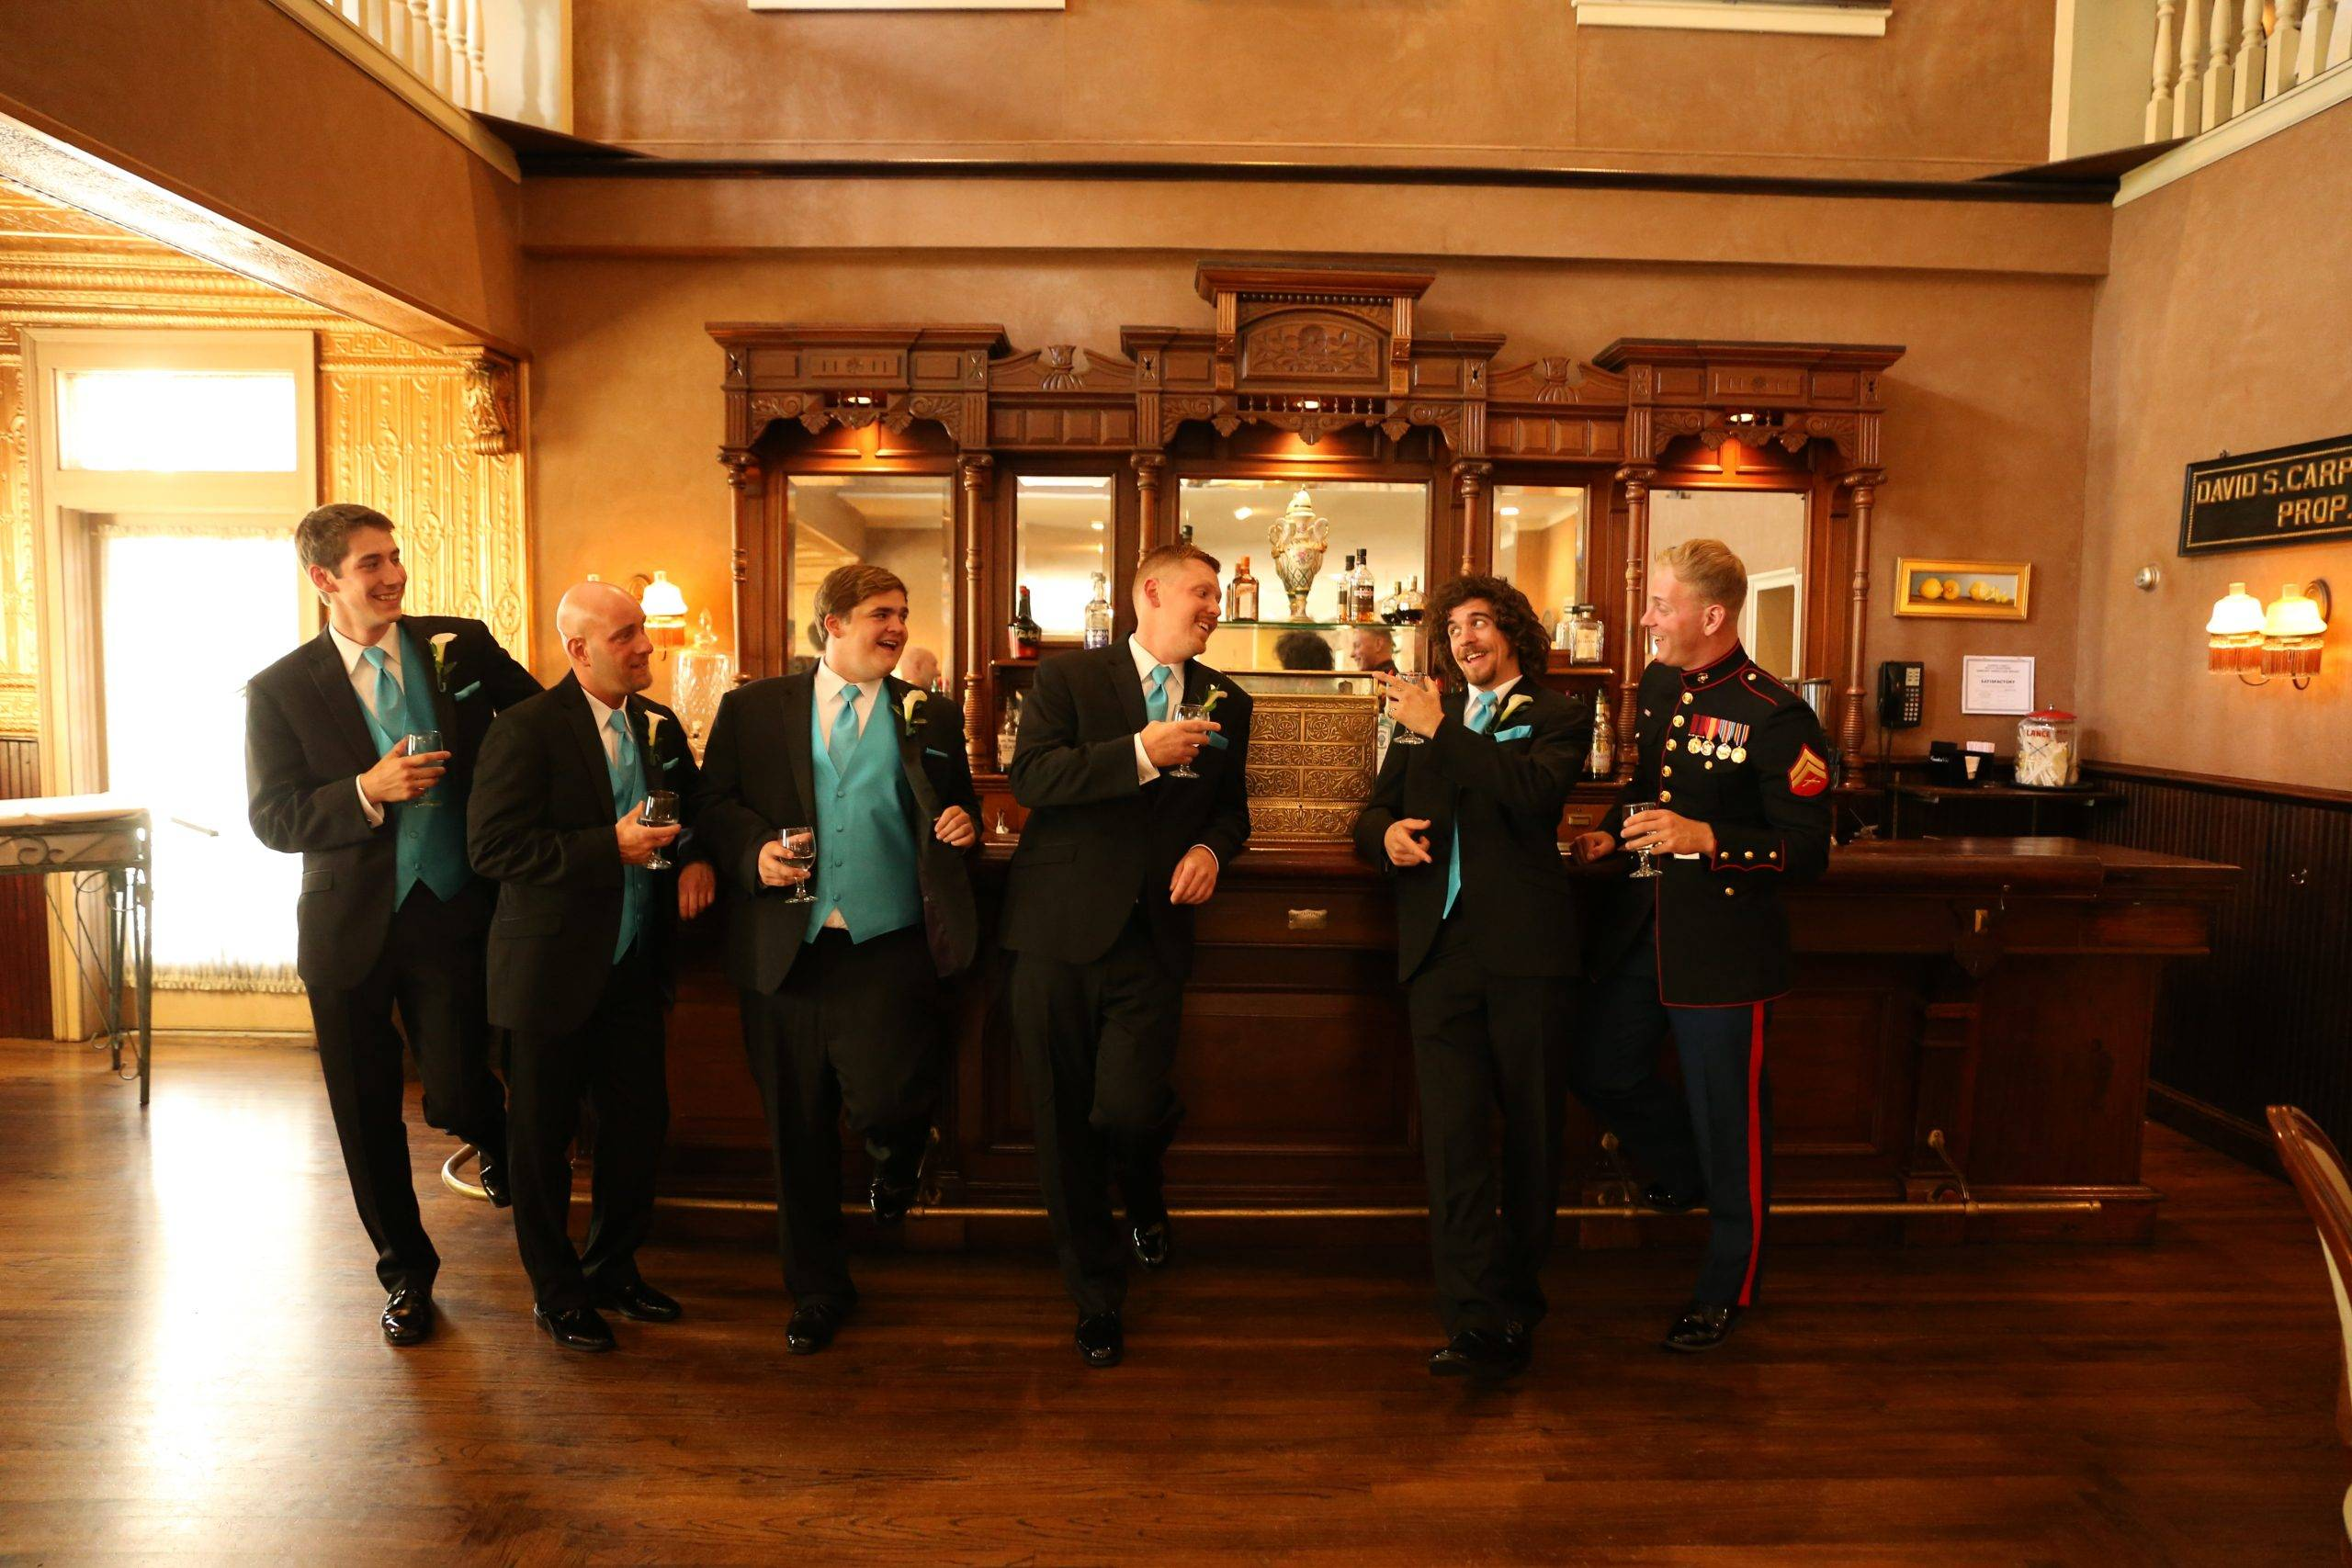 David's Country Inn grooms at the bar